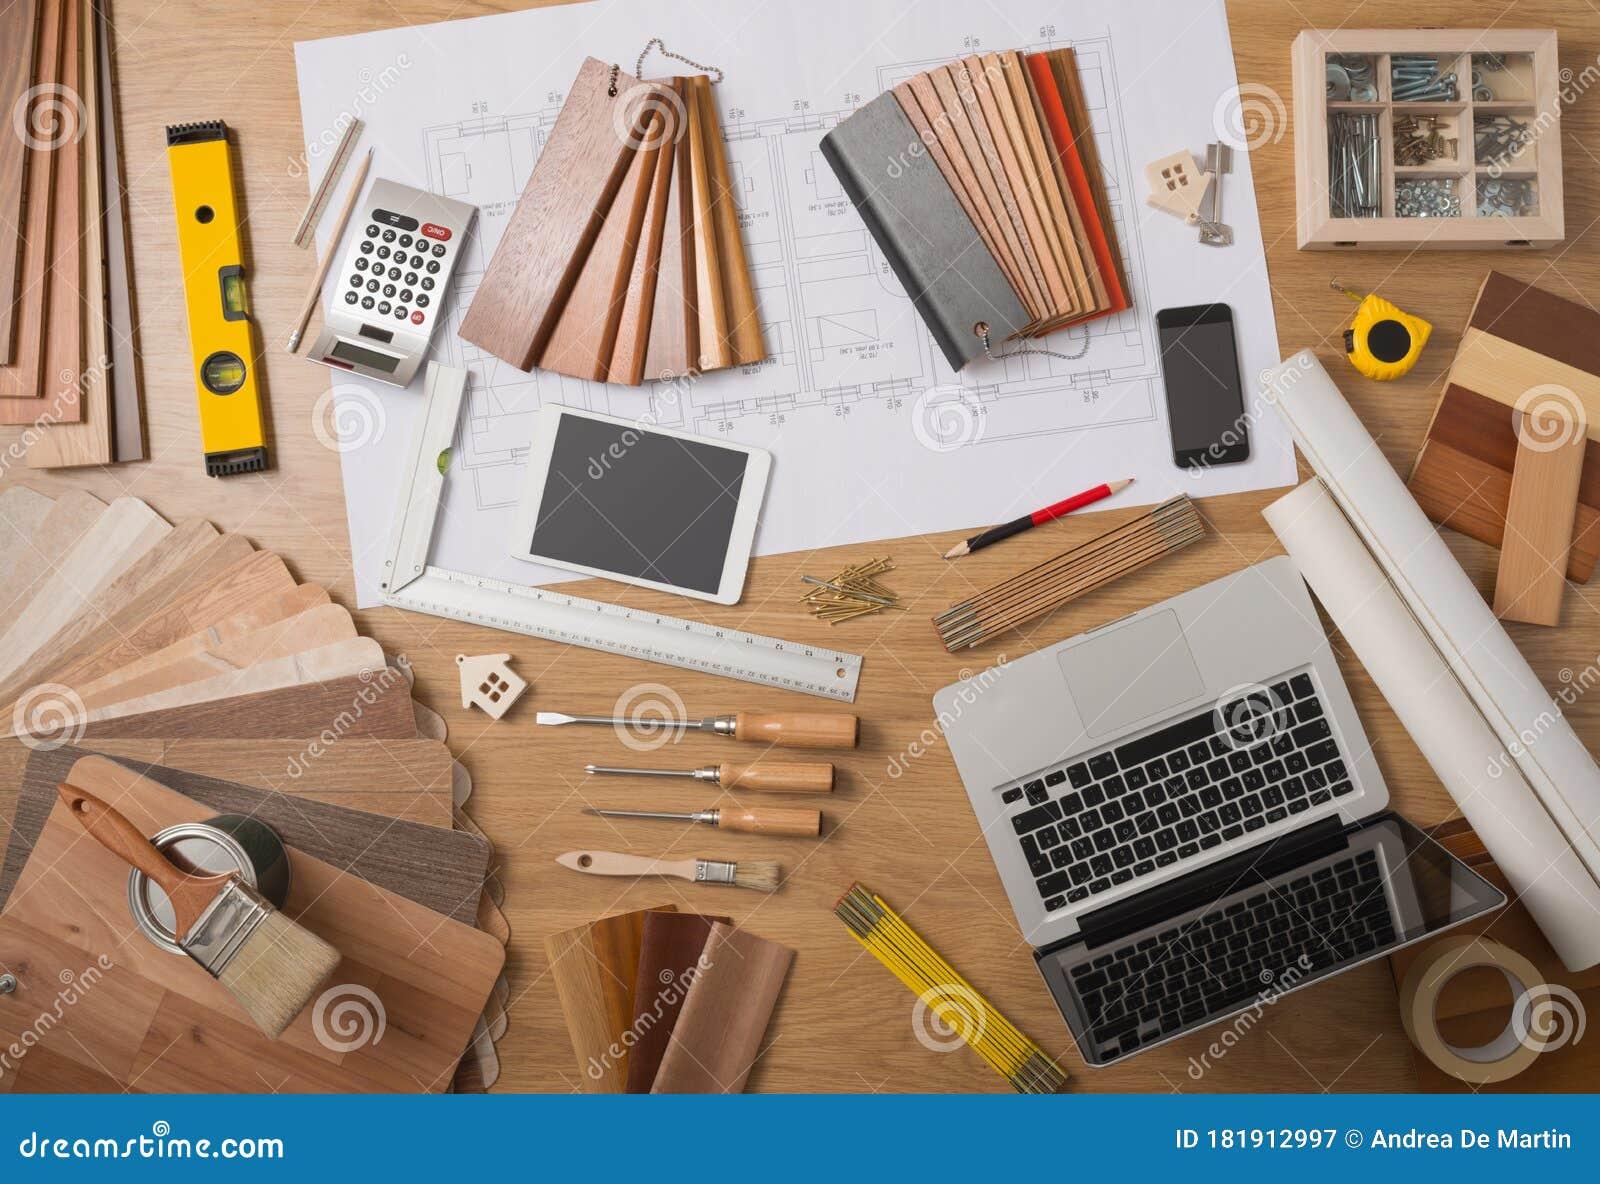 Architect And Interior Designer Work Table Stock Image Image Of Designer Interior 181912997